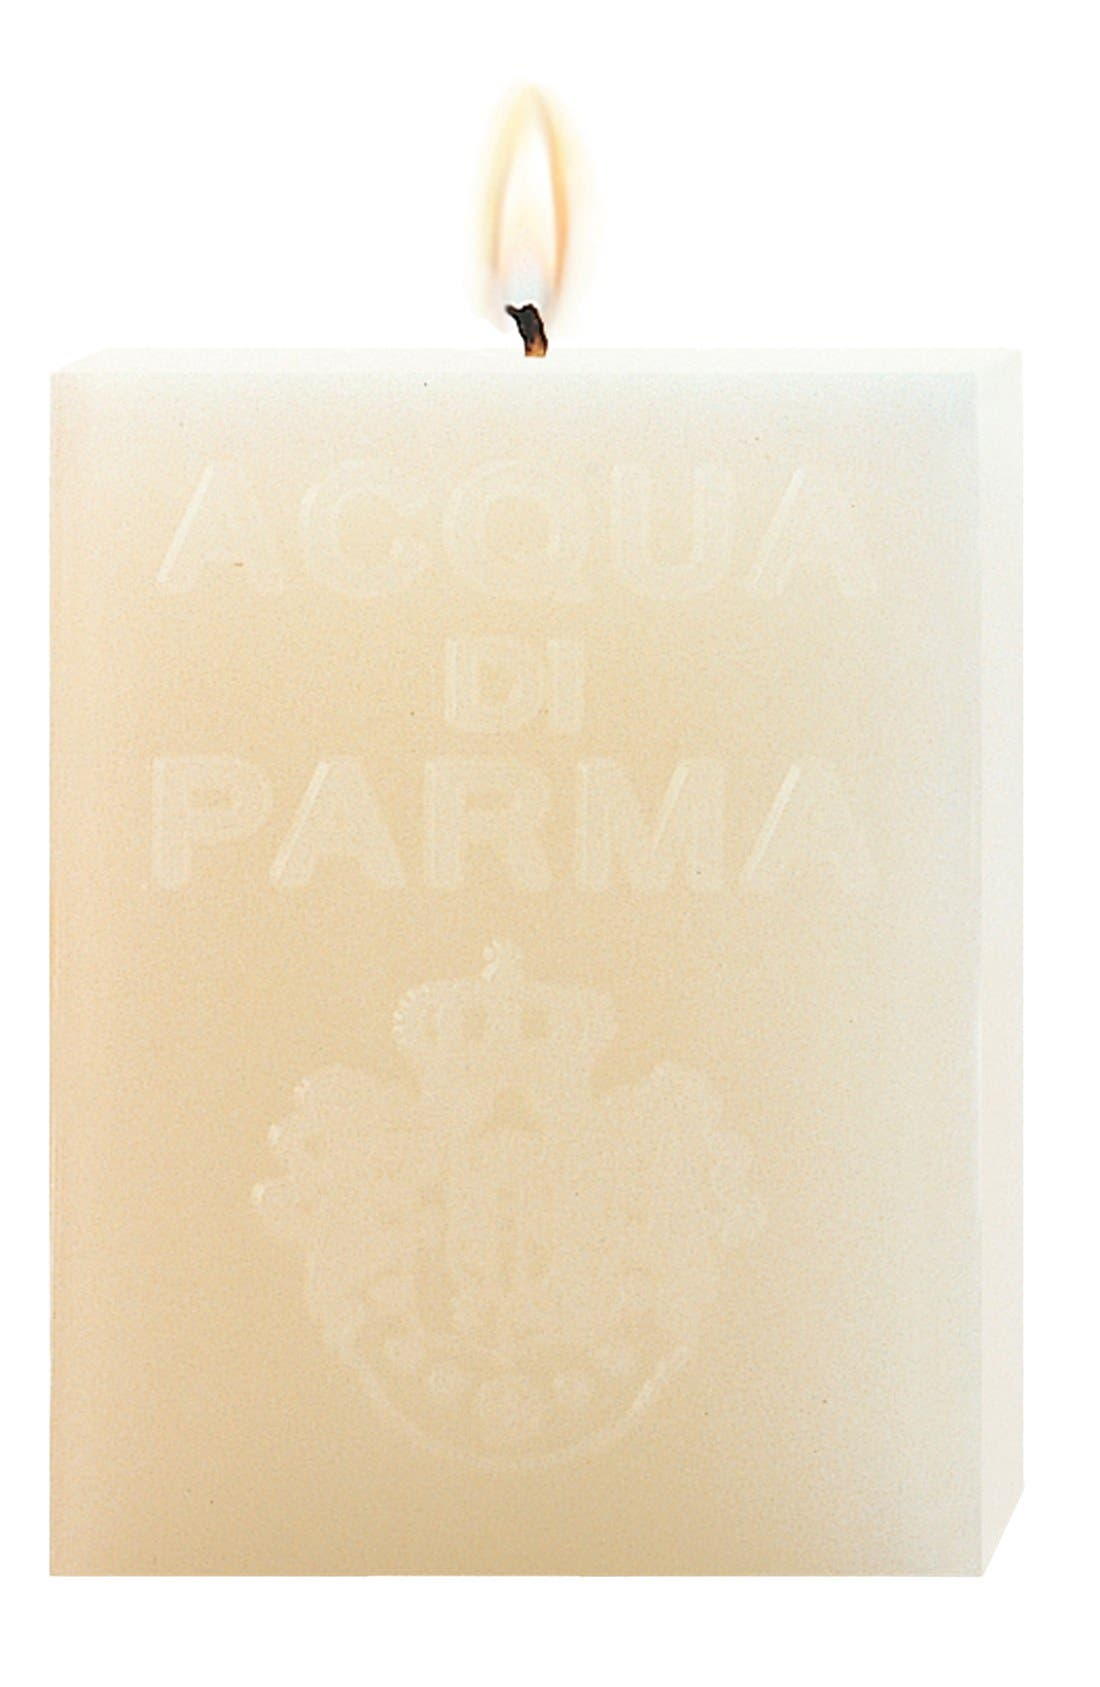 ACQUA DI PARMA 'White Clove' Cube Candle